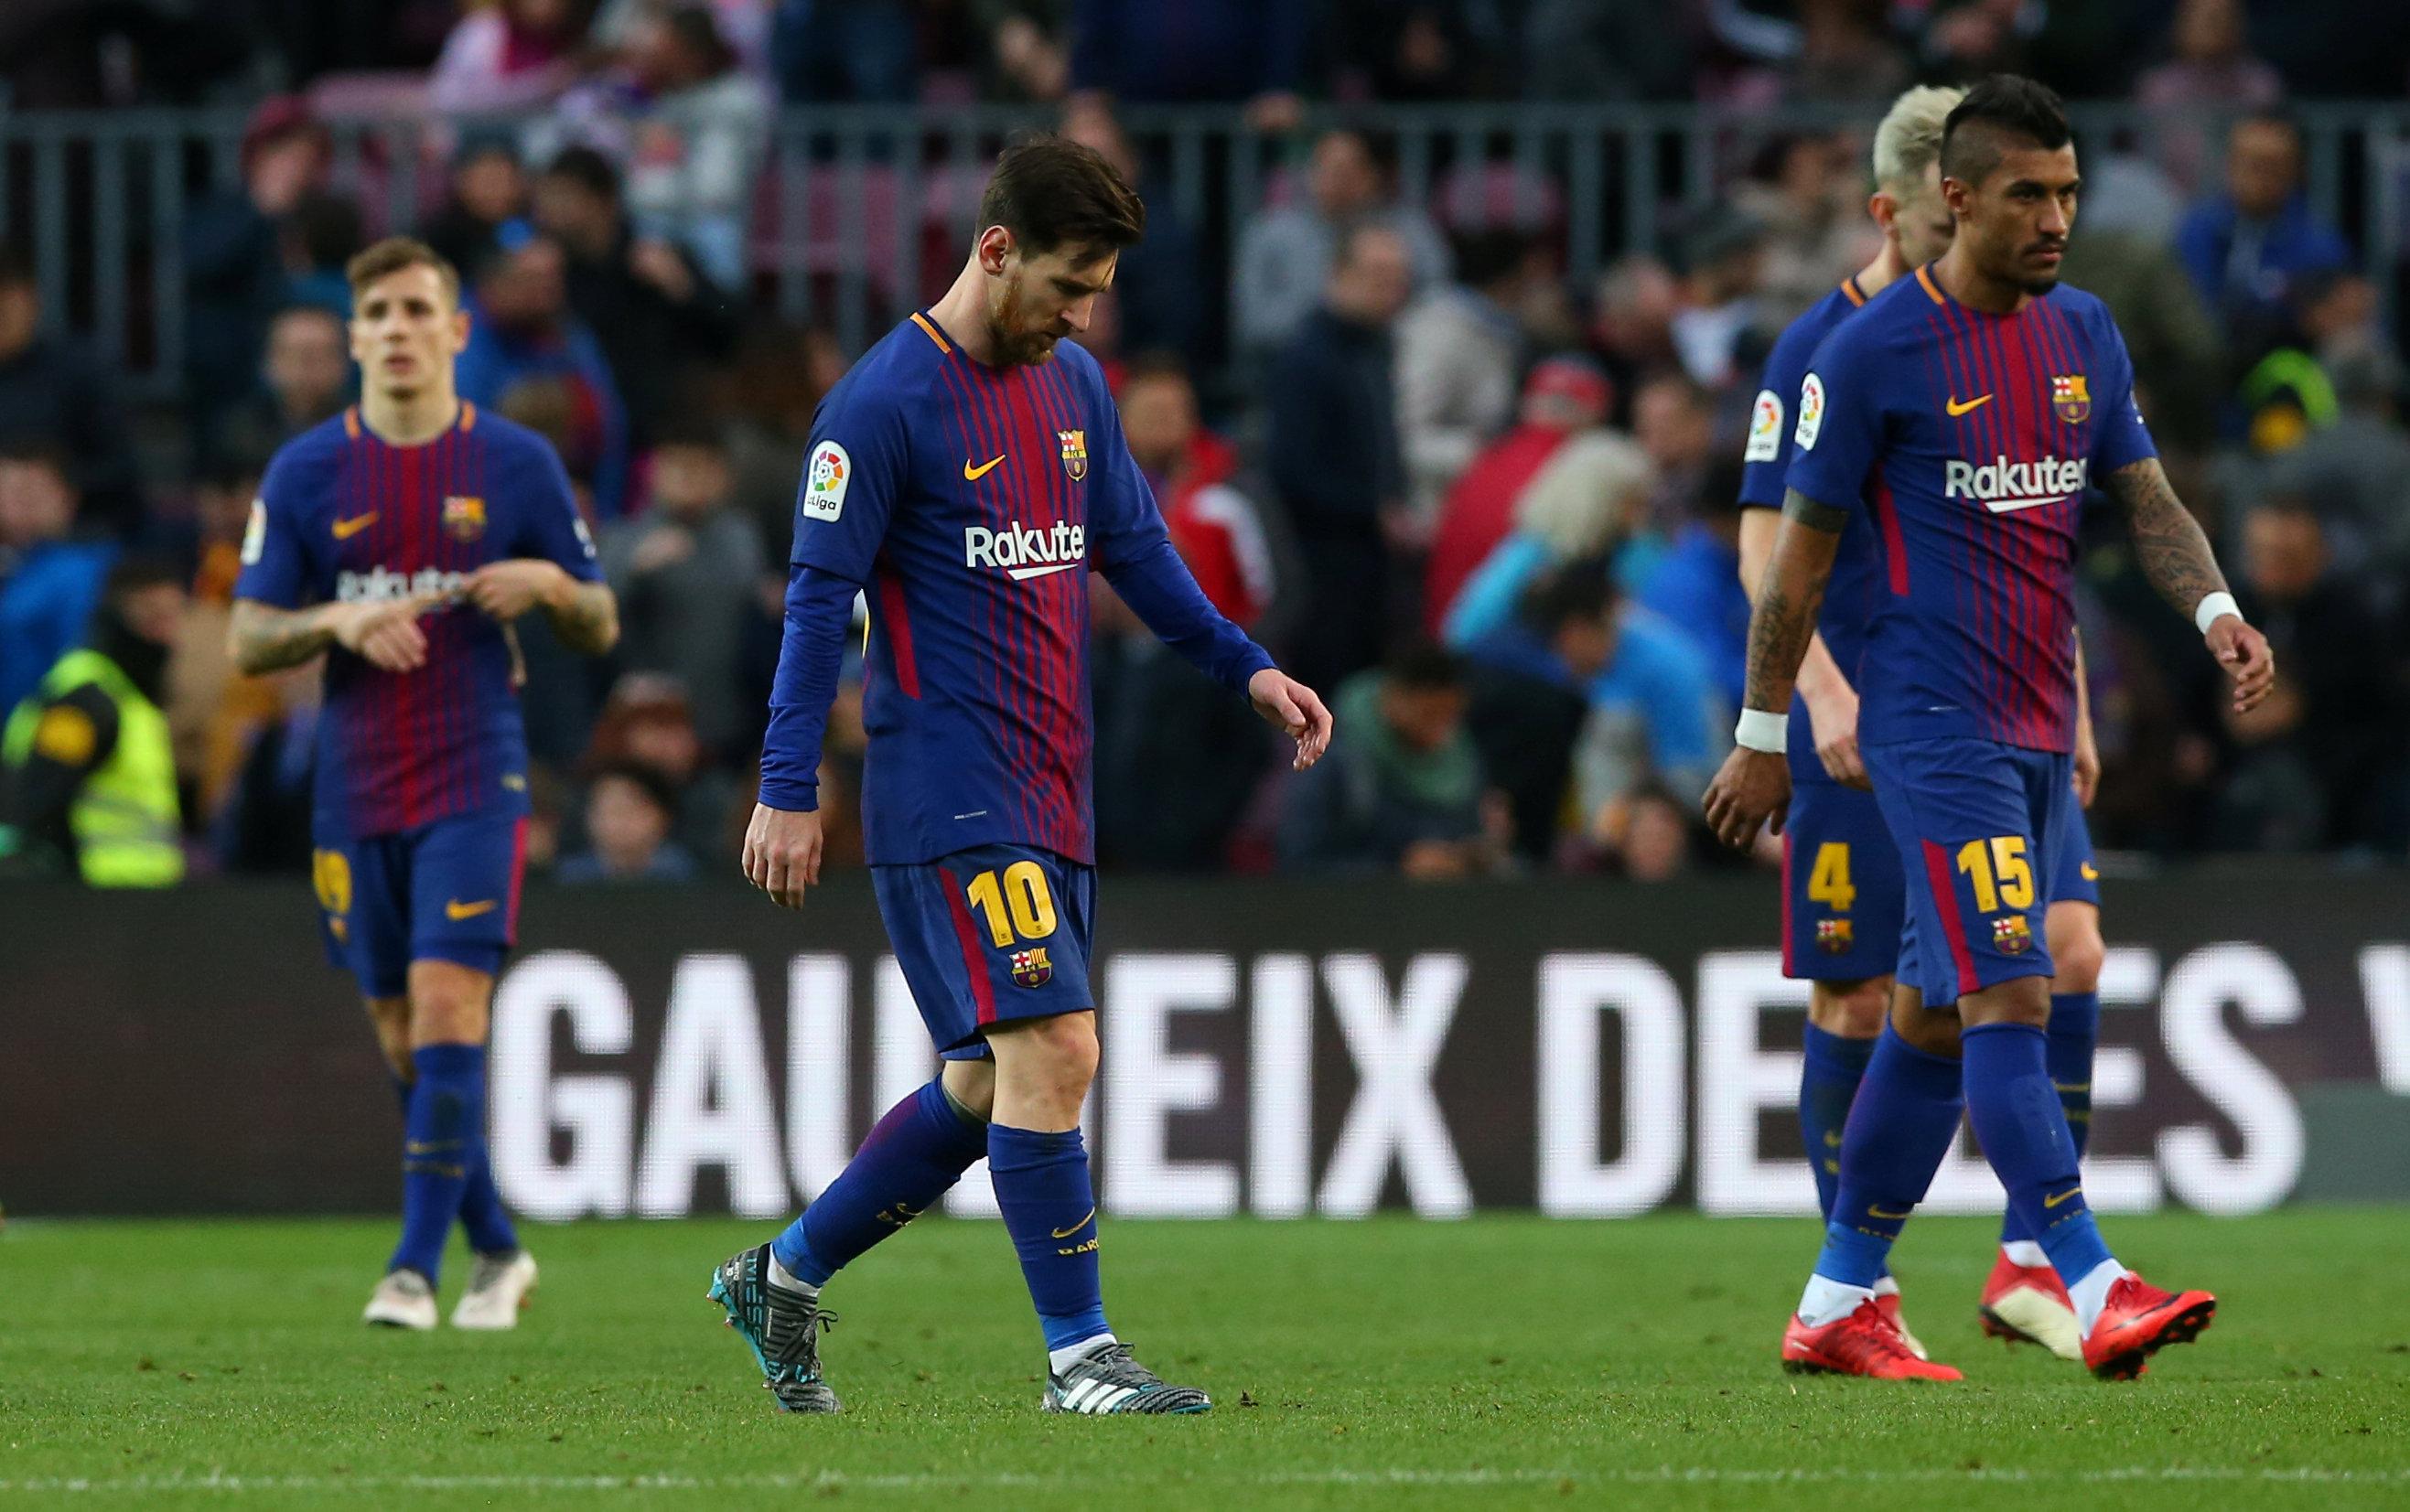 Soccer Football - La Liga Santander - FC Barcelona vs Getafe - Camp Nou, Barcelona, Spain - February 11, 2018   Barcelonau2019s Lionel Messi looks dejected after the match    REUTERS/Albert Gea